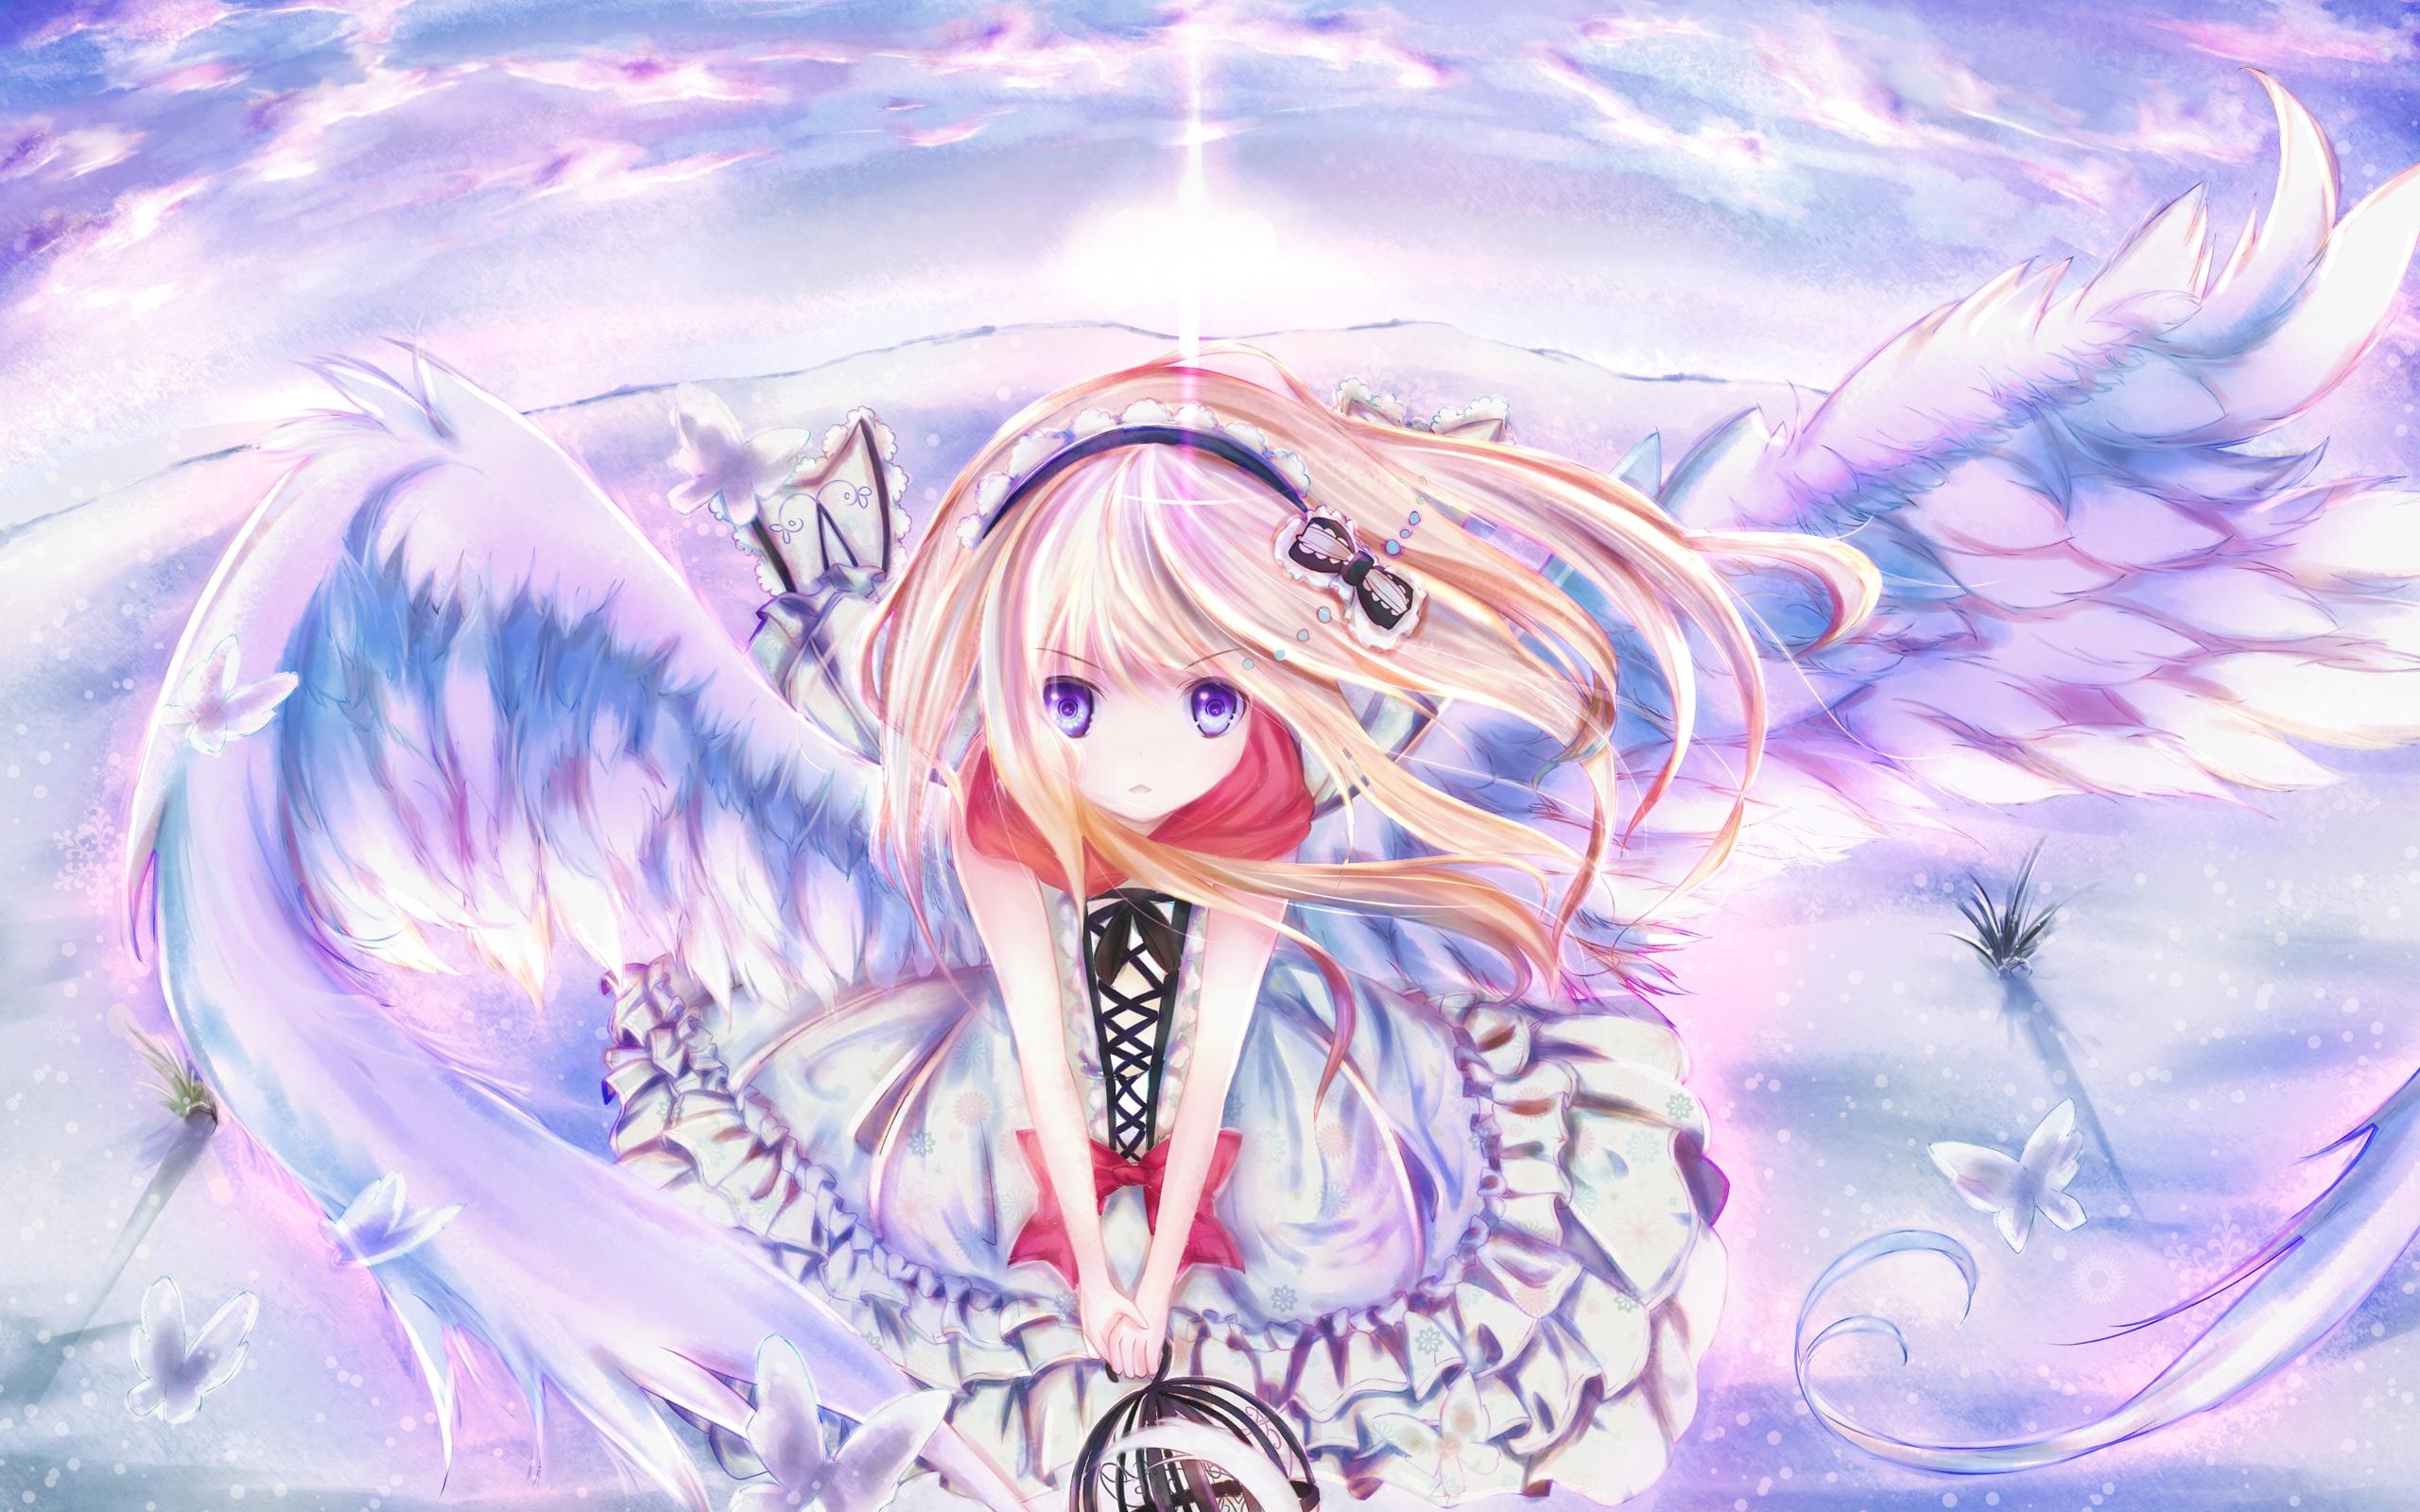 Wallpaper Anime Girl Wings Sky Flying Butterfly Hairpin 2560x1600